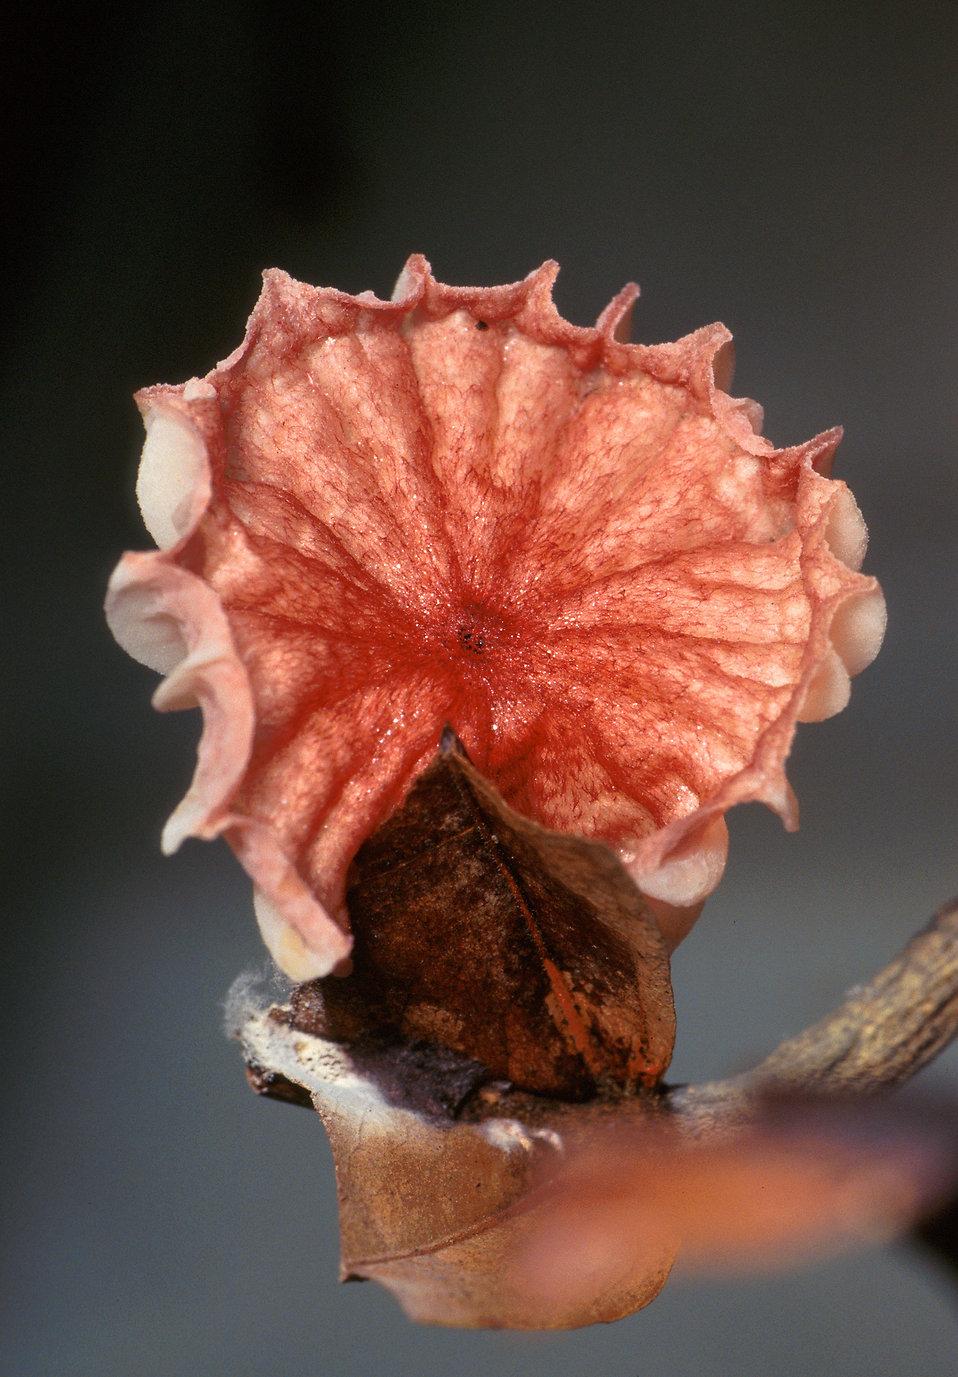 A red Crinipellis perniciosa mushroom : Free Stock Photo